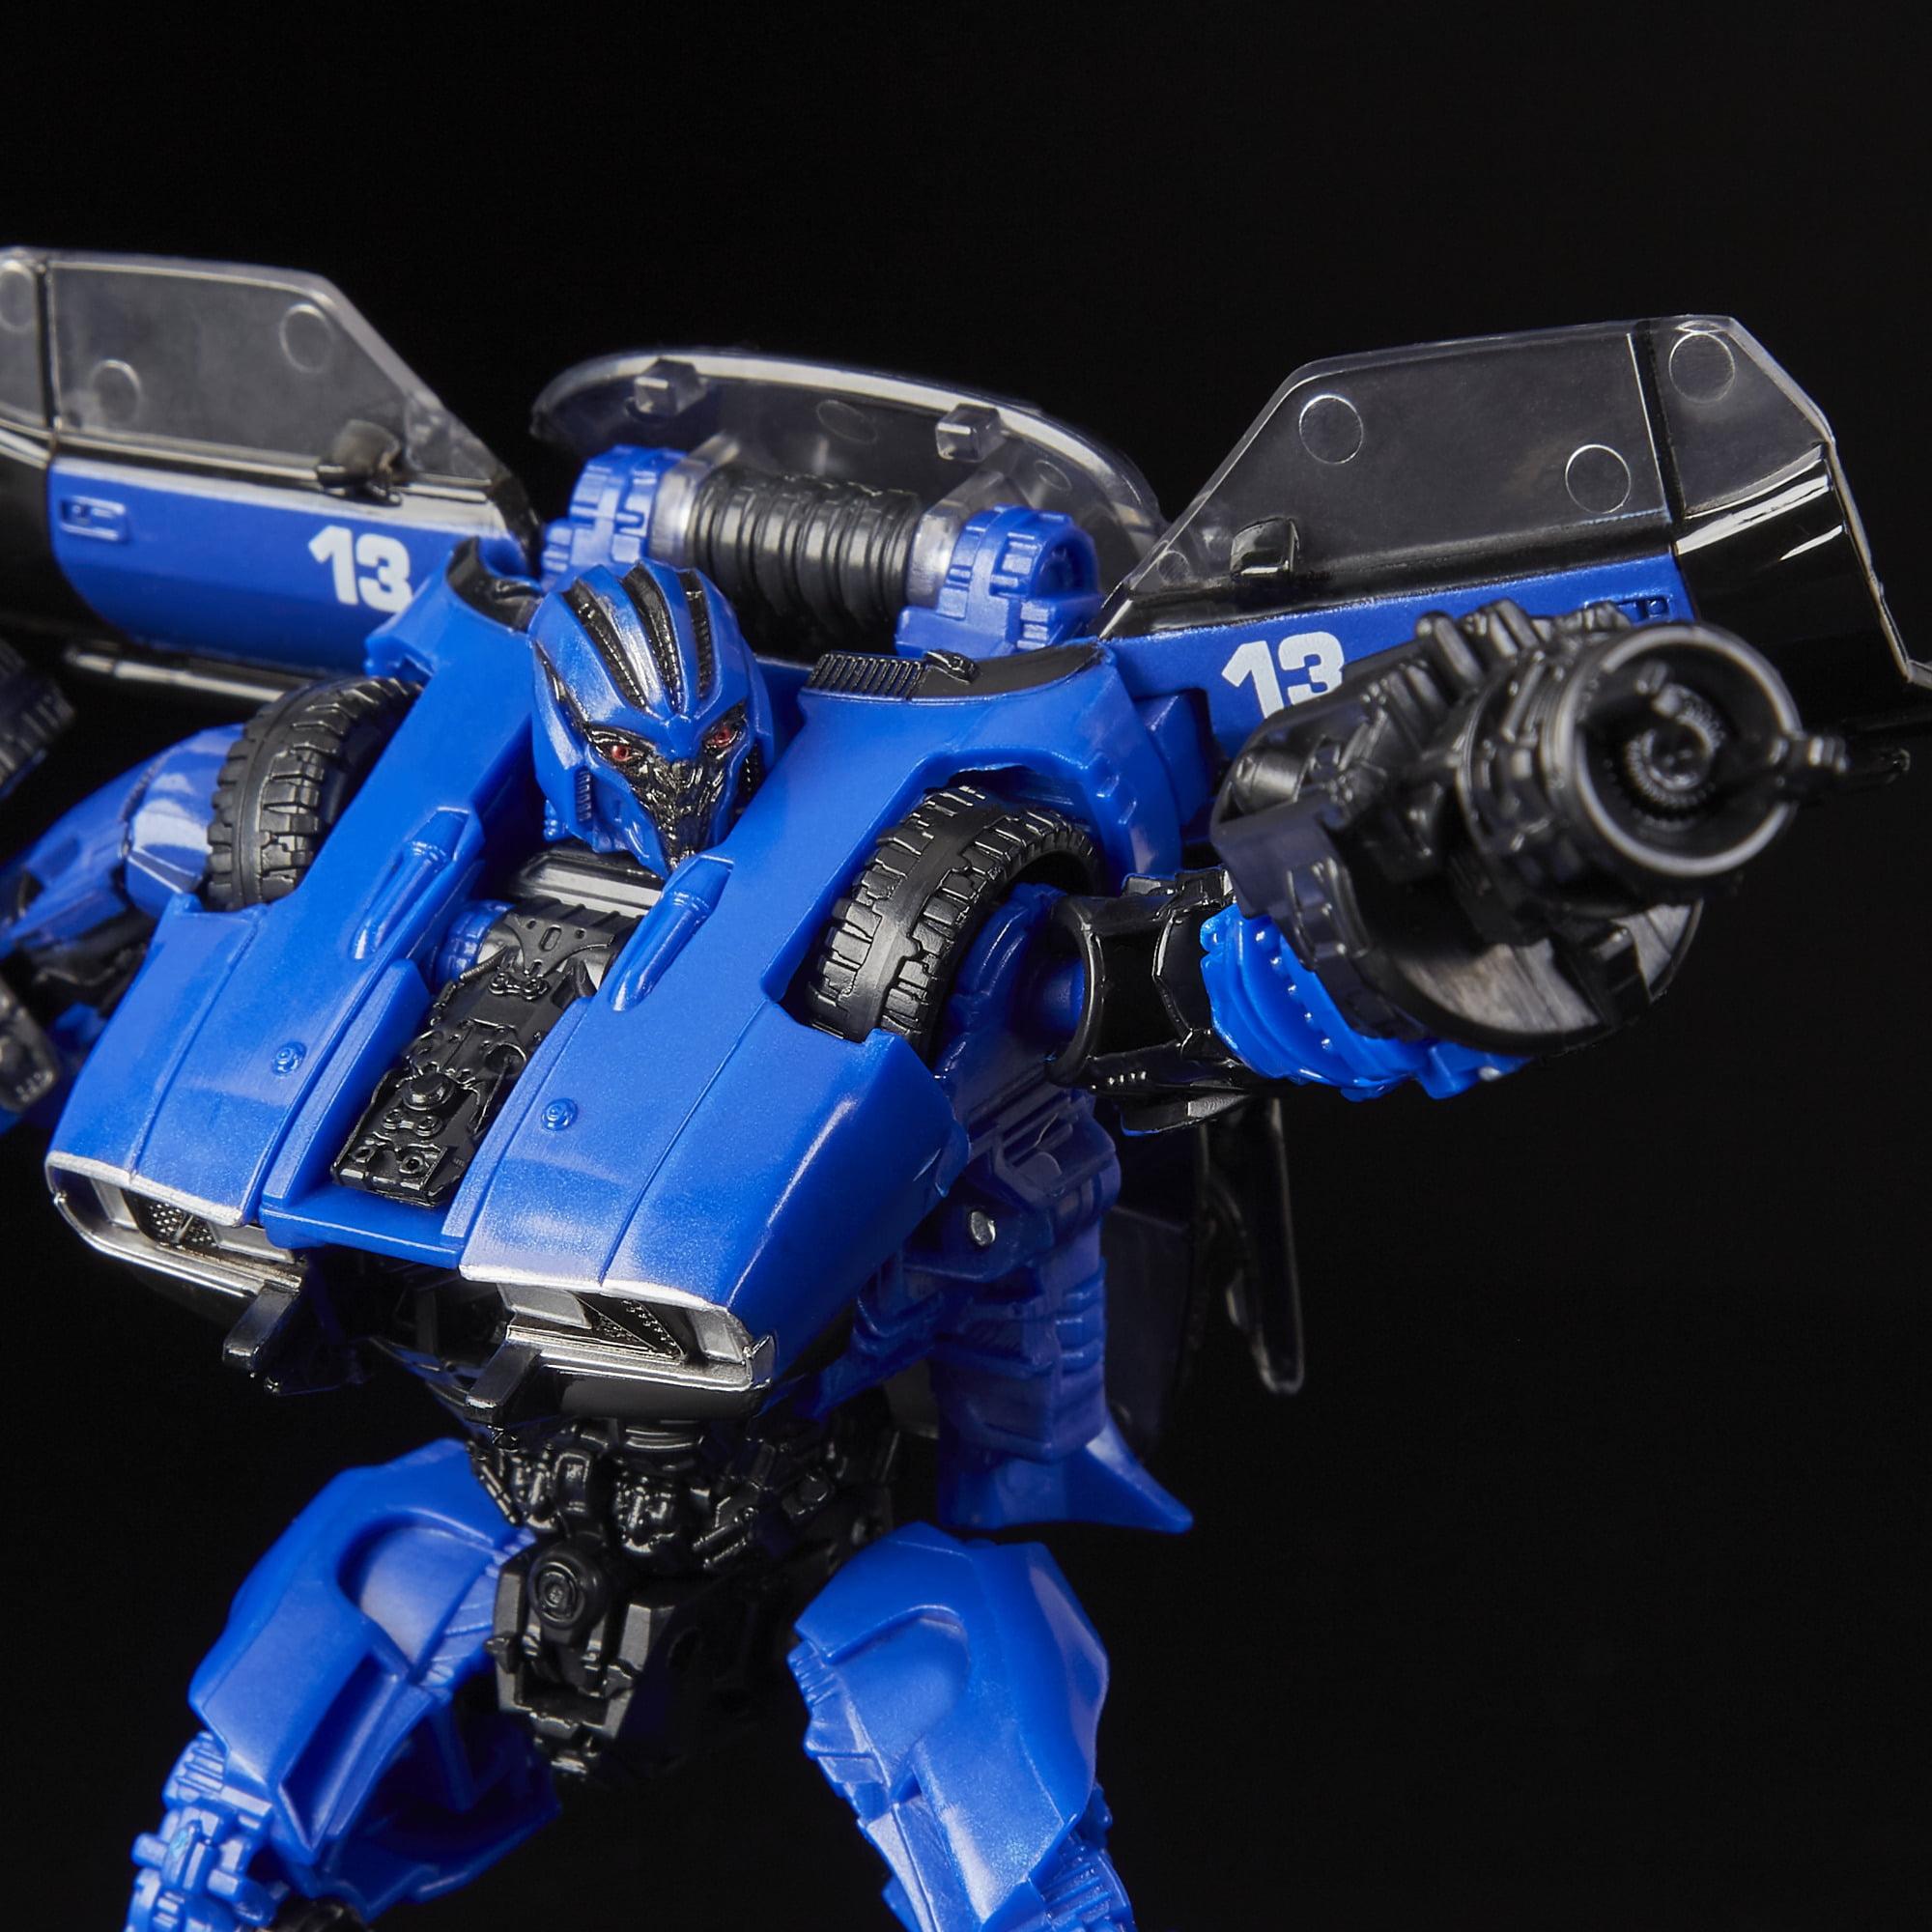 Transformers Toys Studio Series 46 Deluxe Class Bumblebee Movie Dropkick Figure